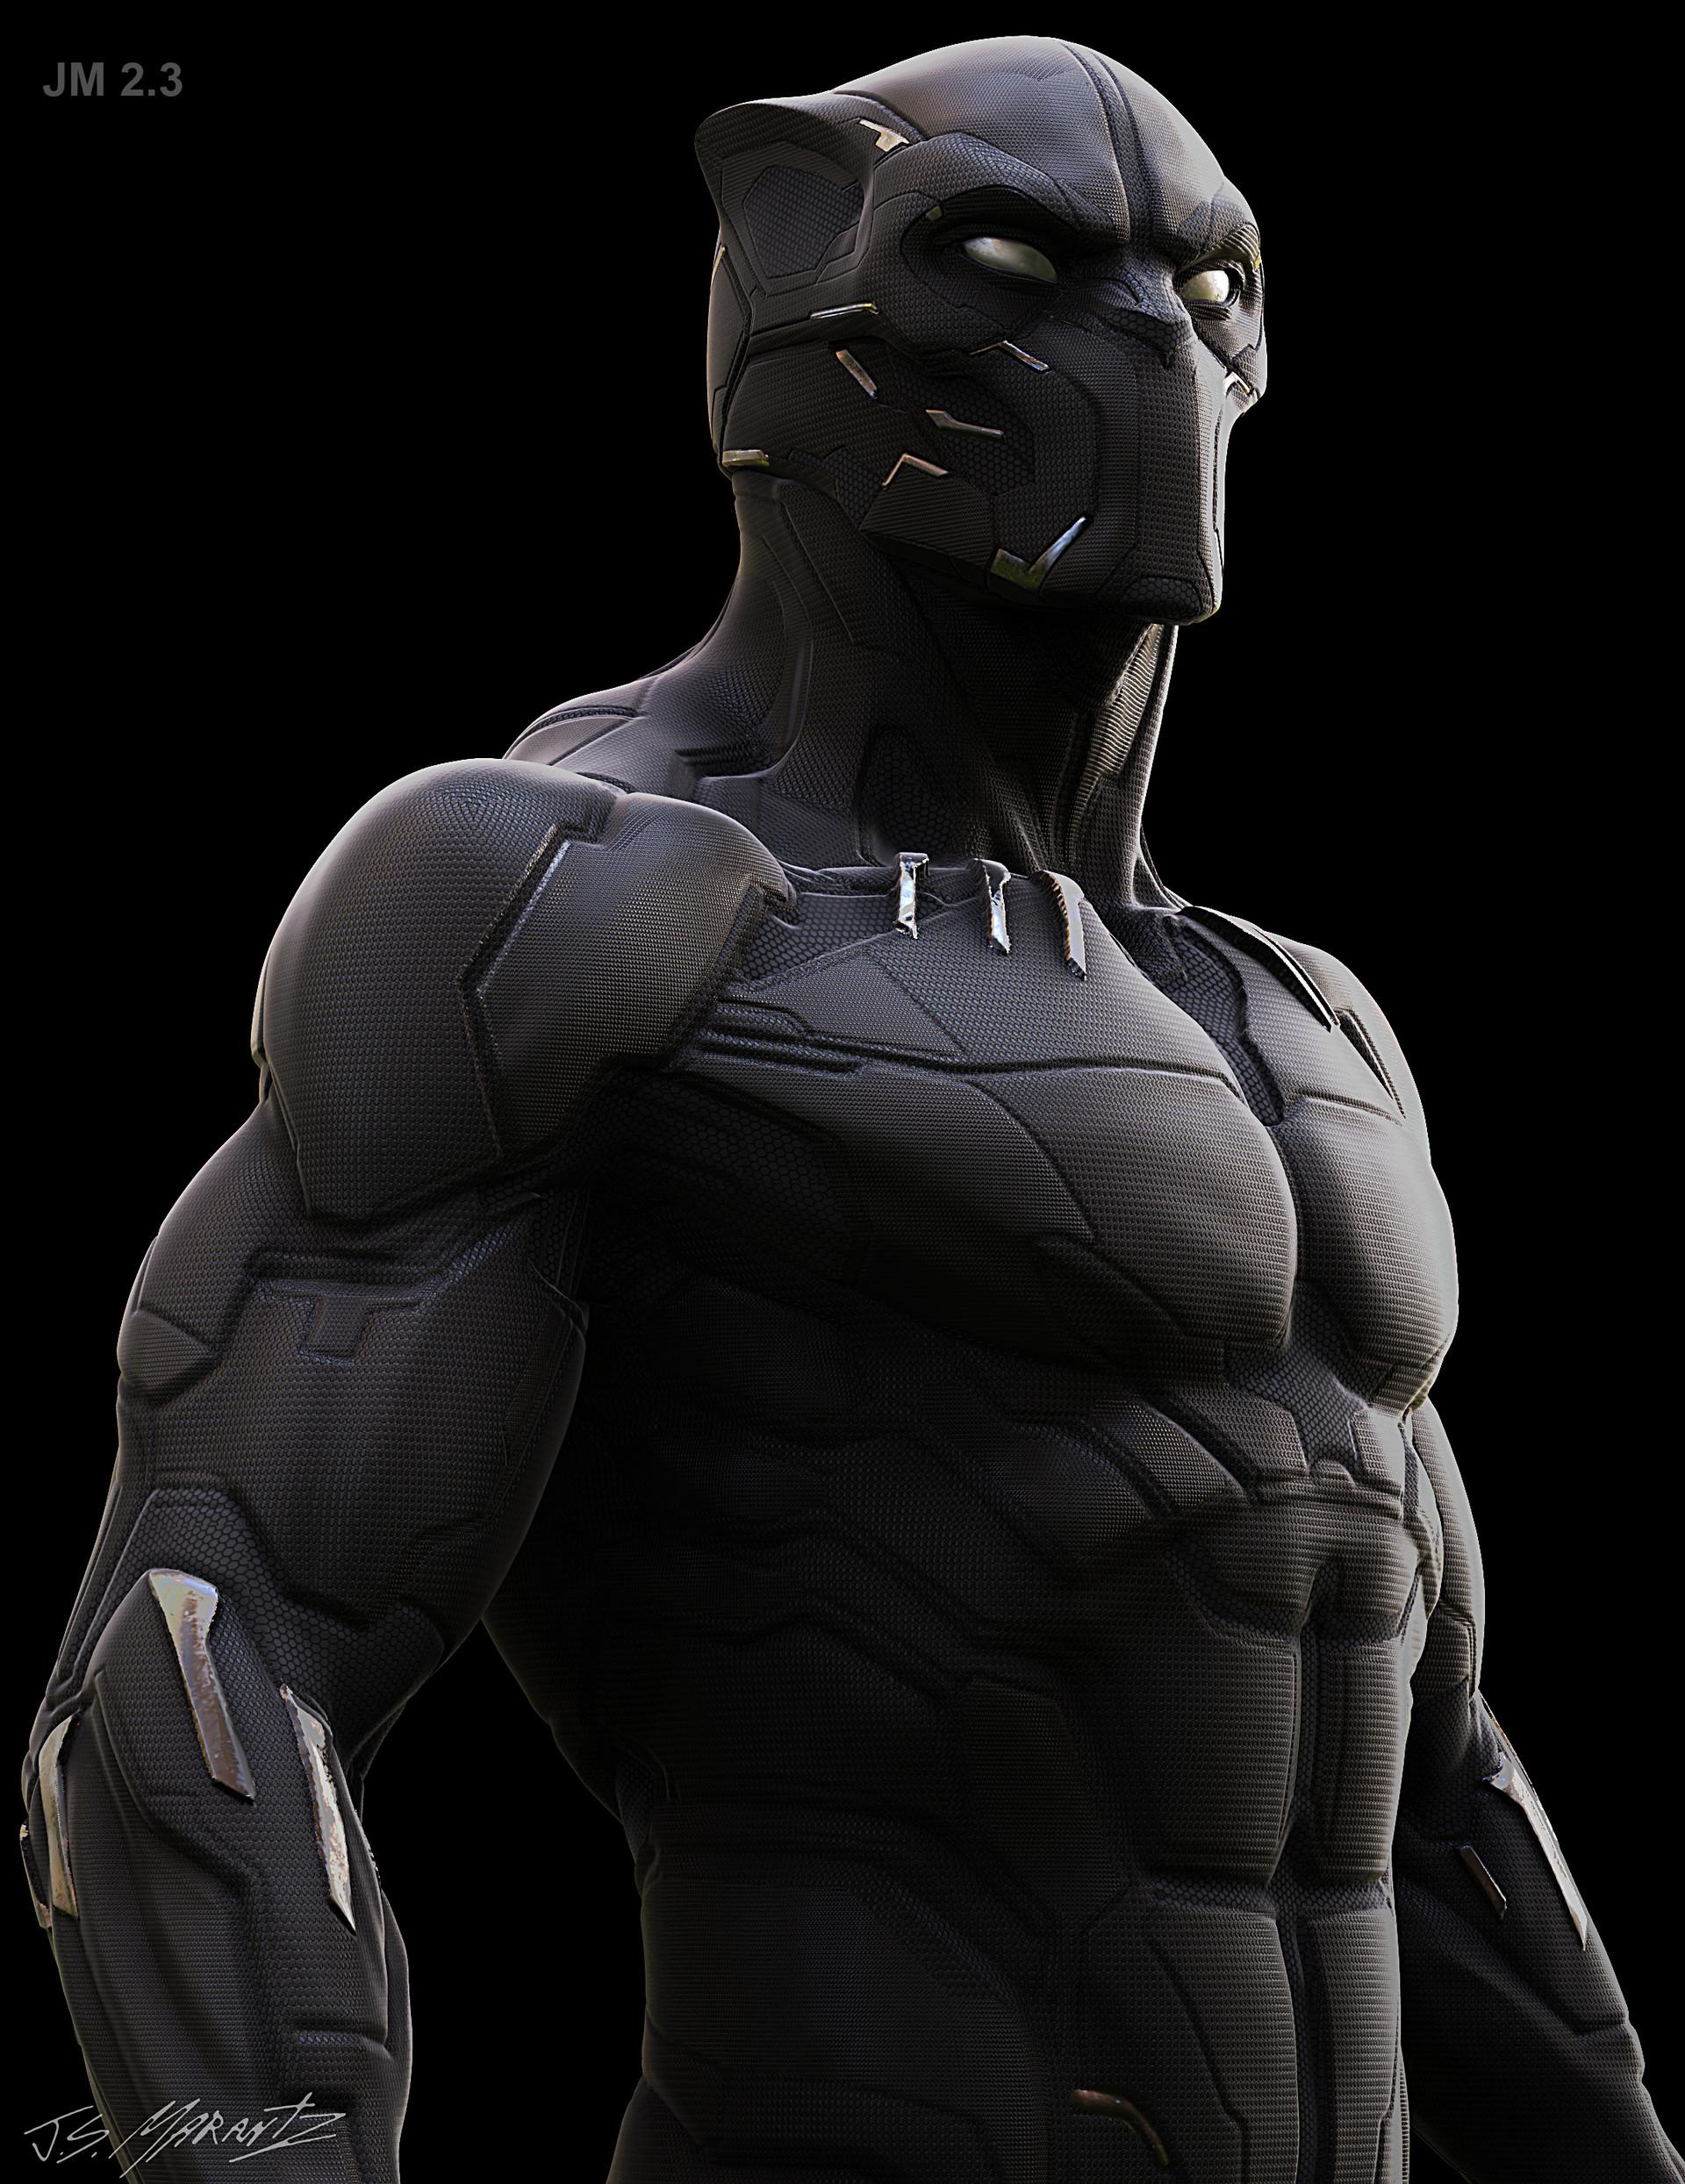 Jerx marantz panther black 4 2